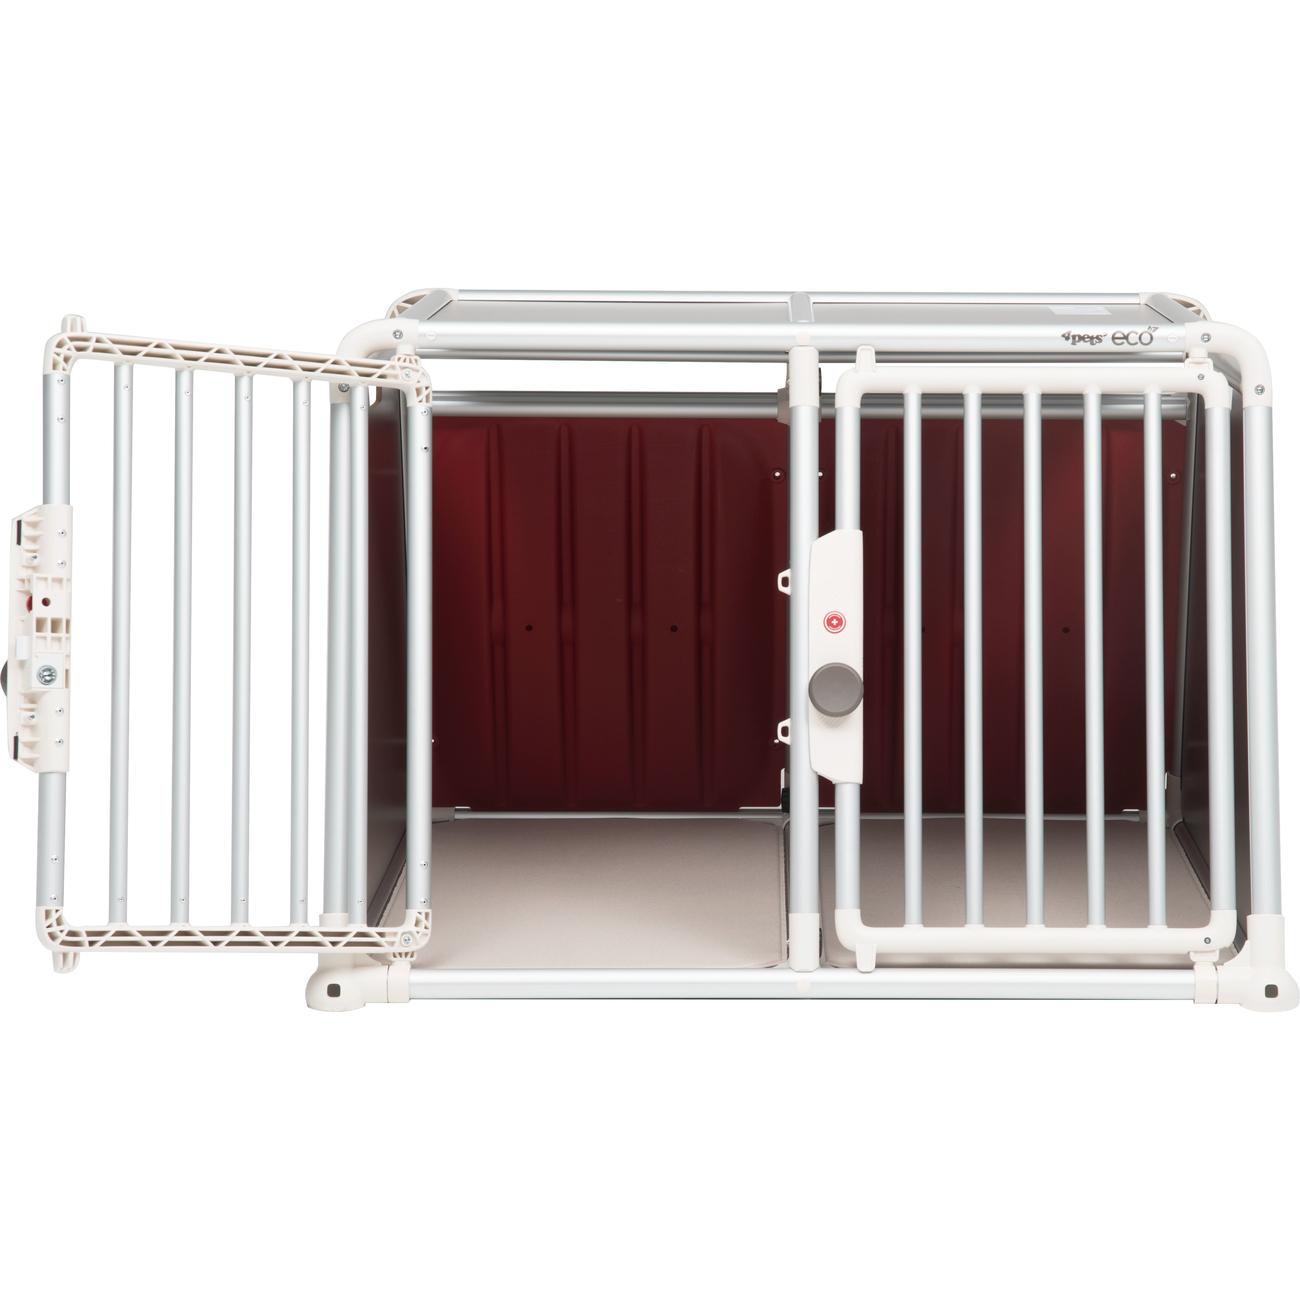 4pets Alu Autobox für 2 Hunde ECO 22, Bild 5